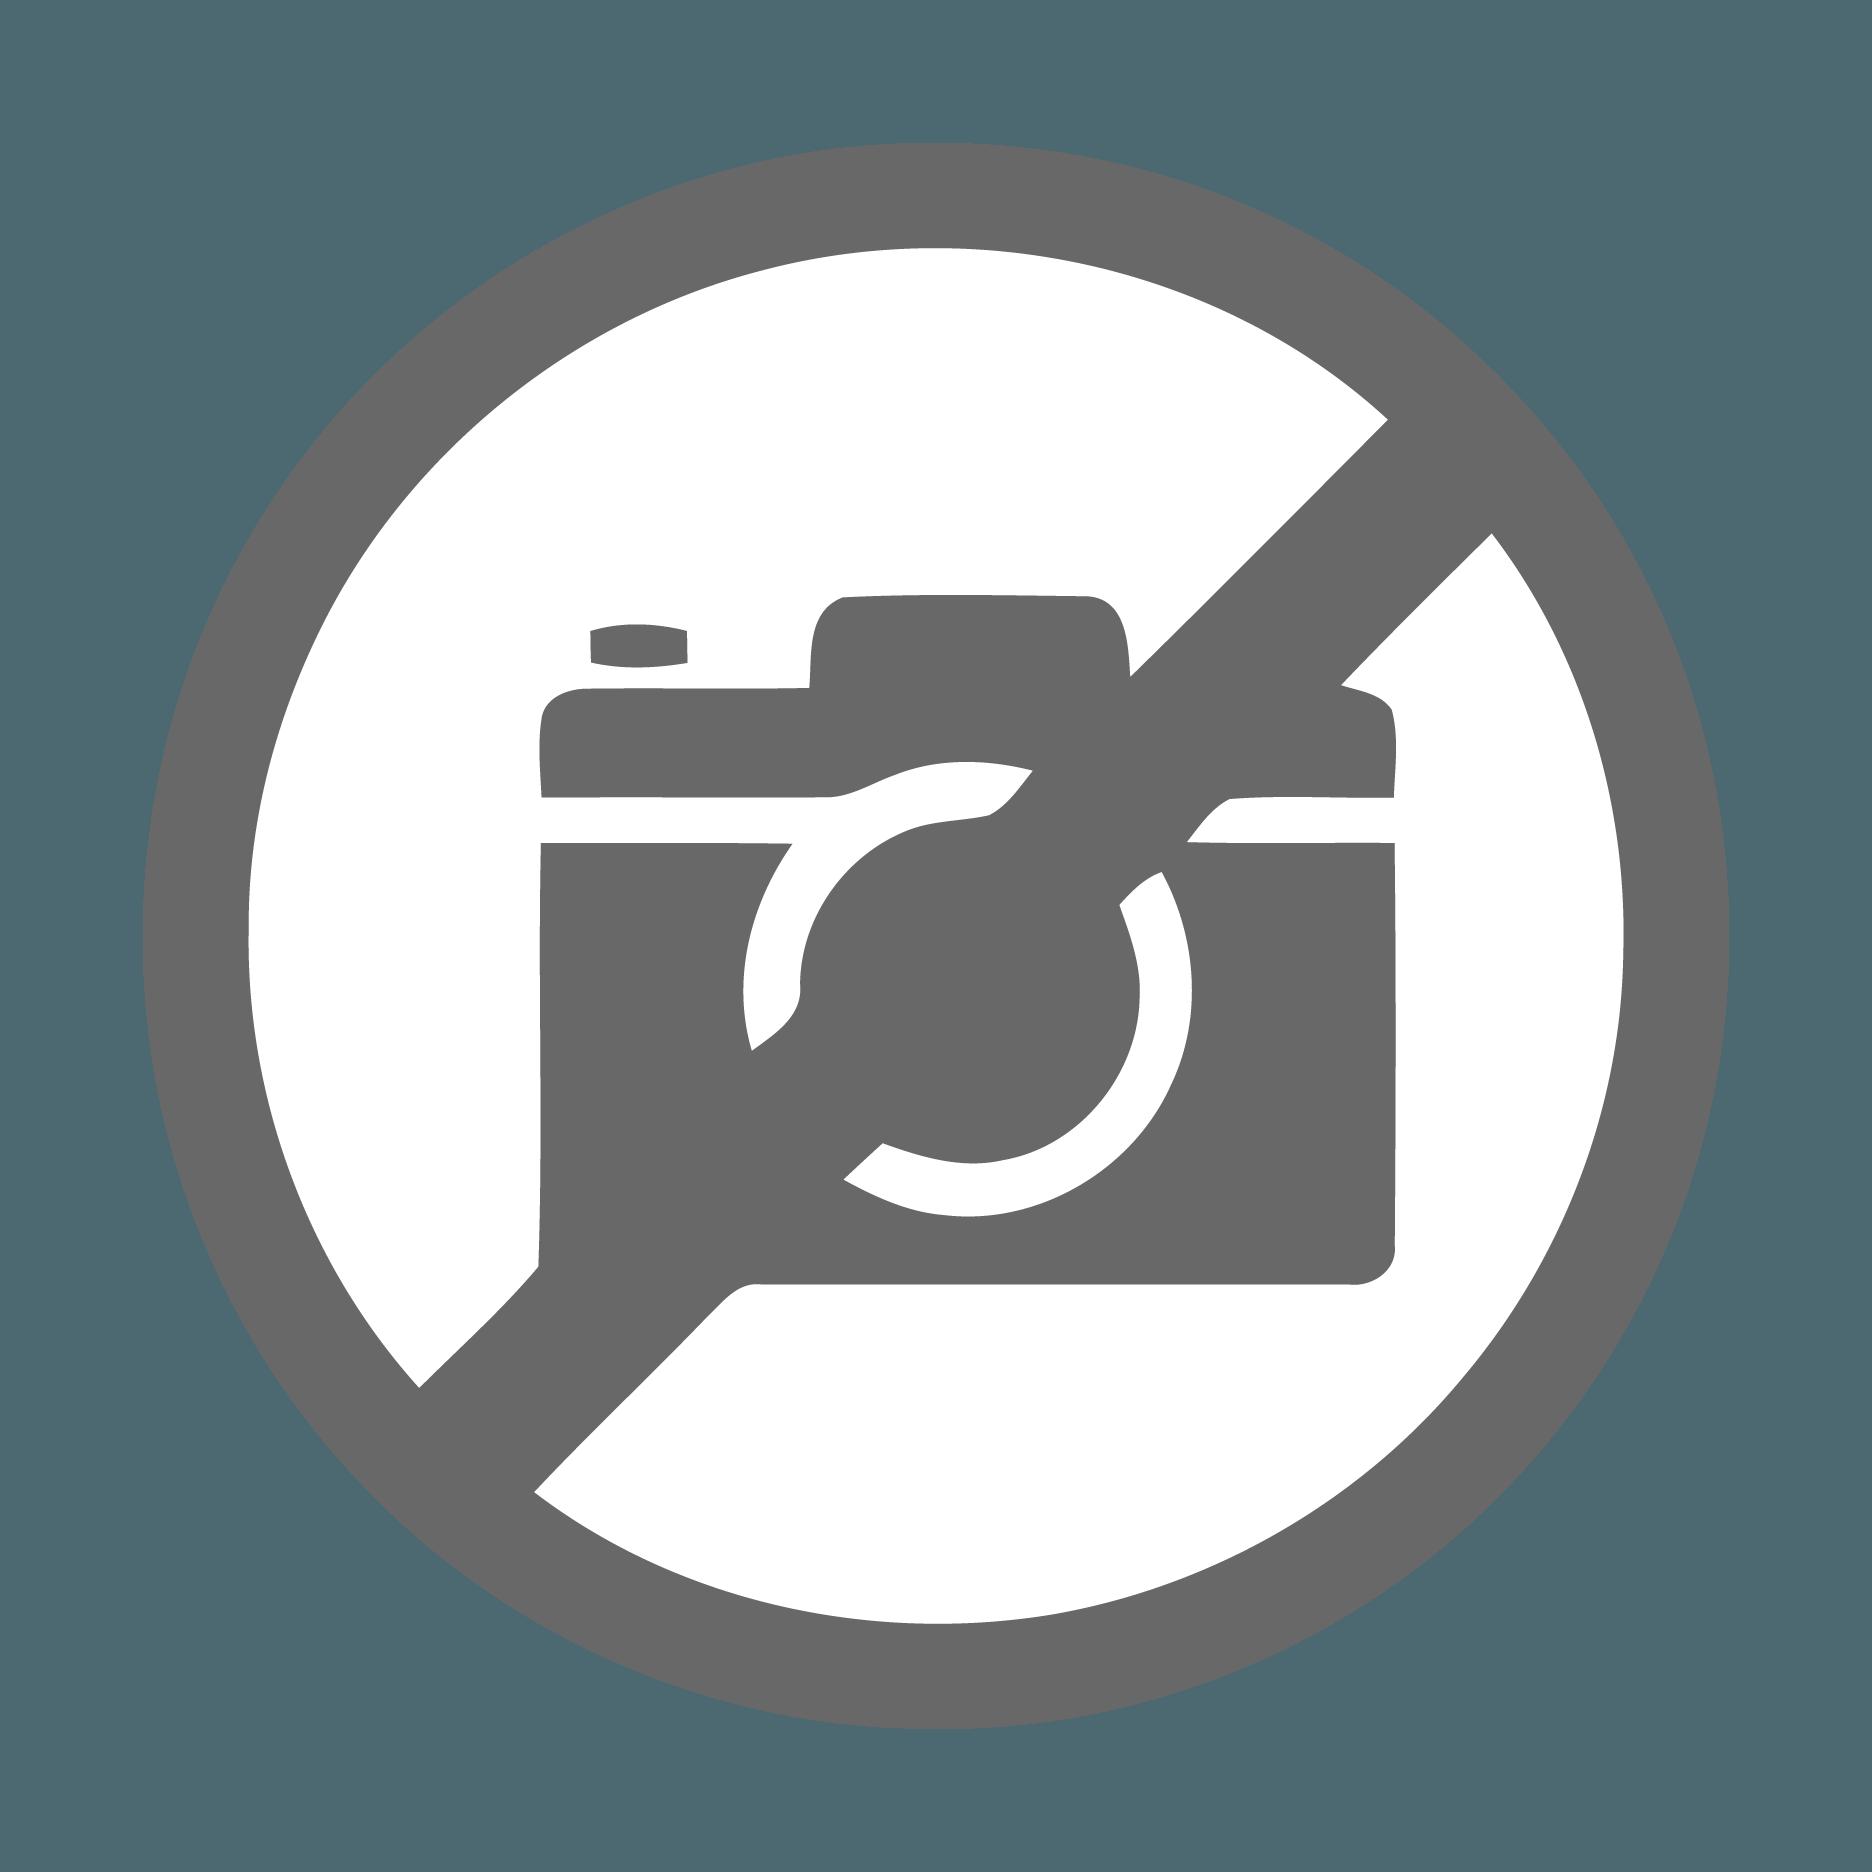 Edwin Huizinga (Hivos)